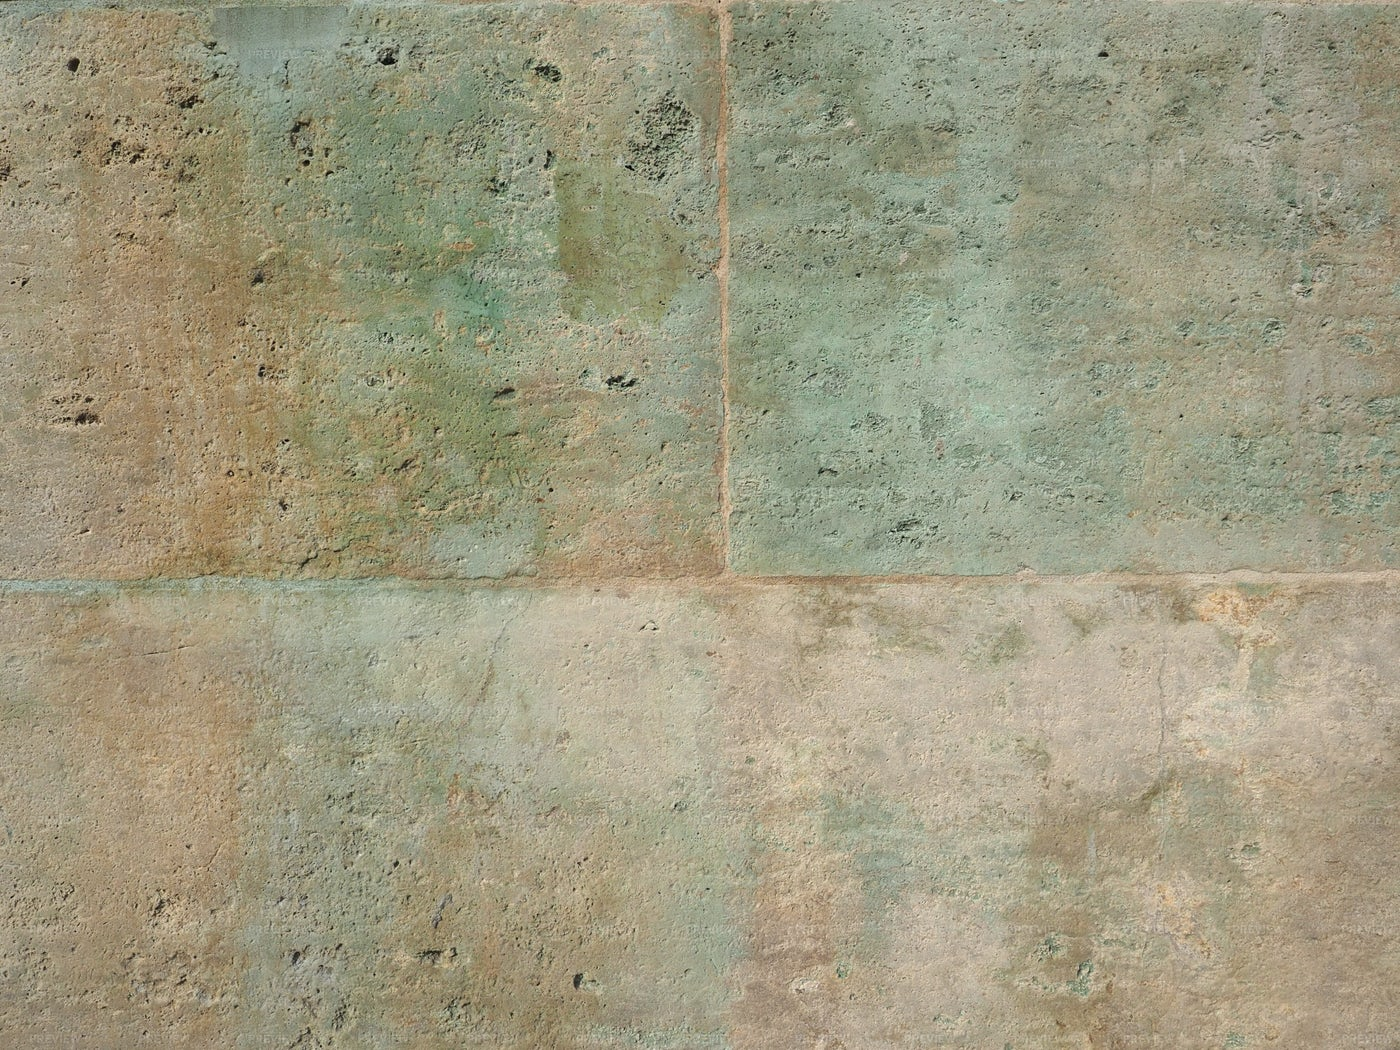 Weathered Stone Wall: Stock Photos